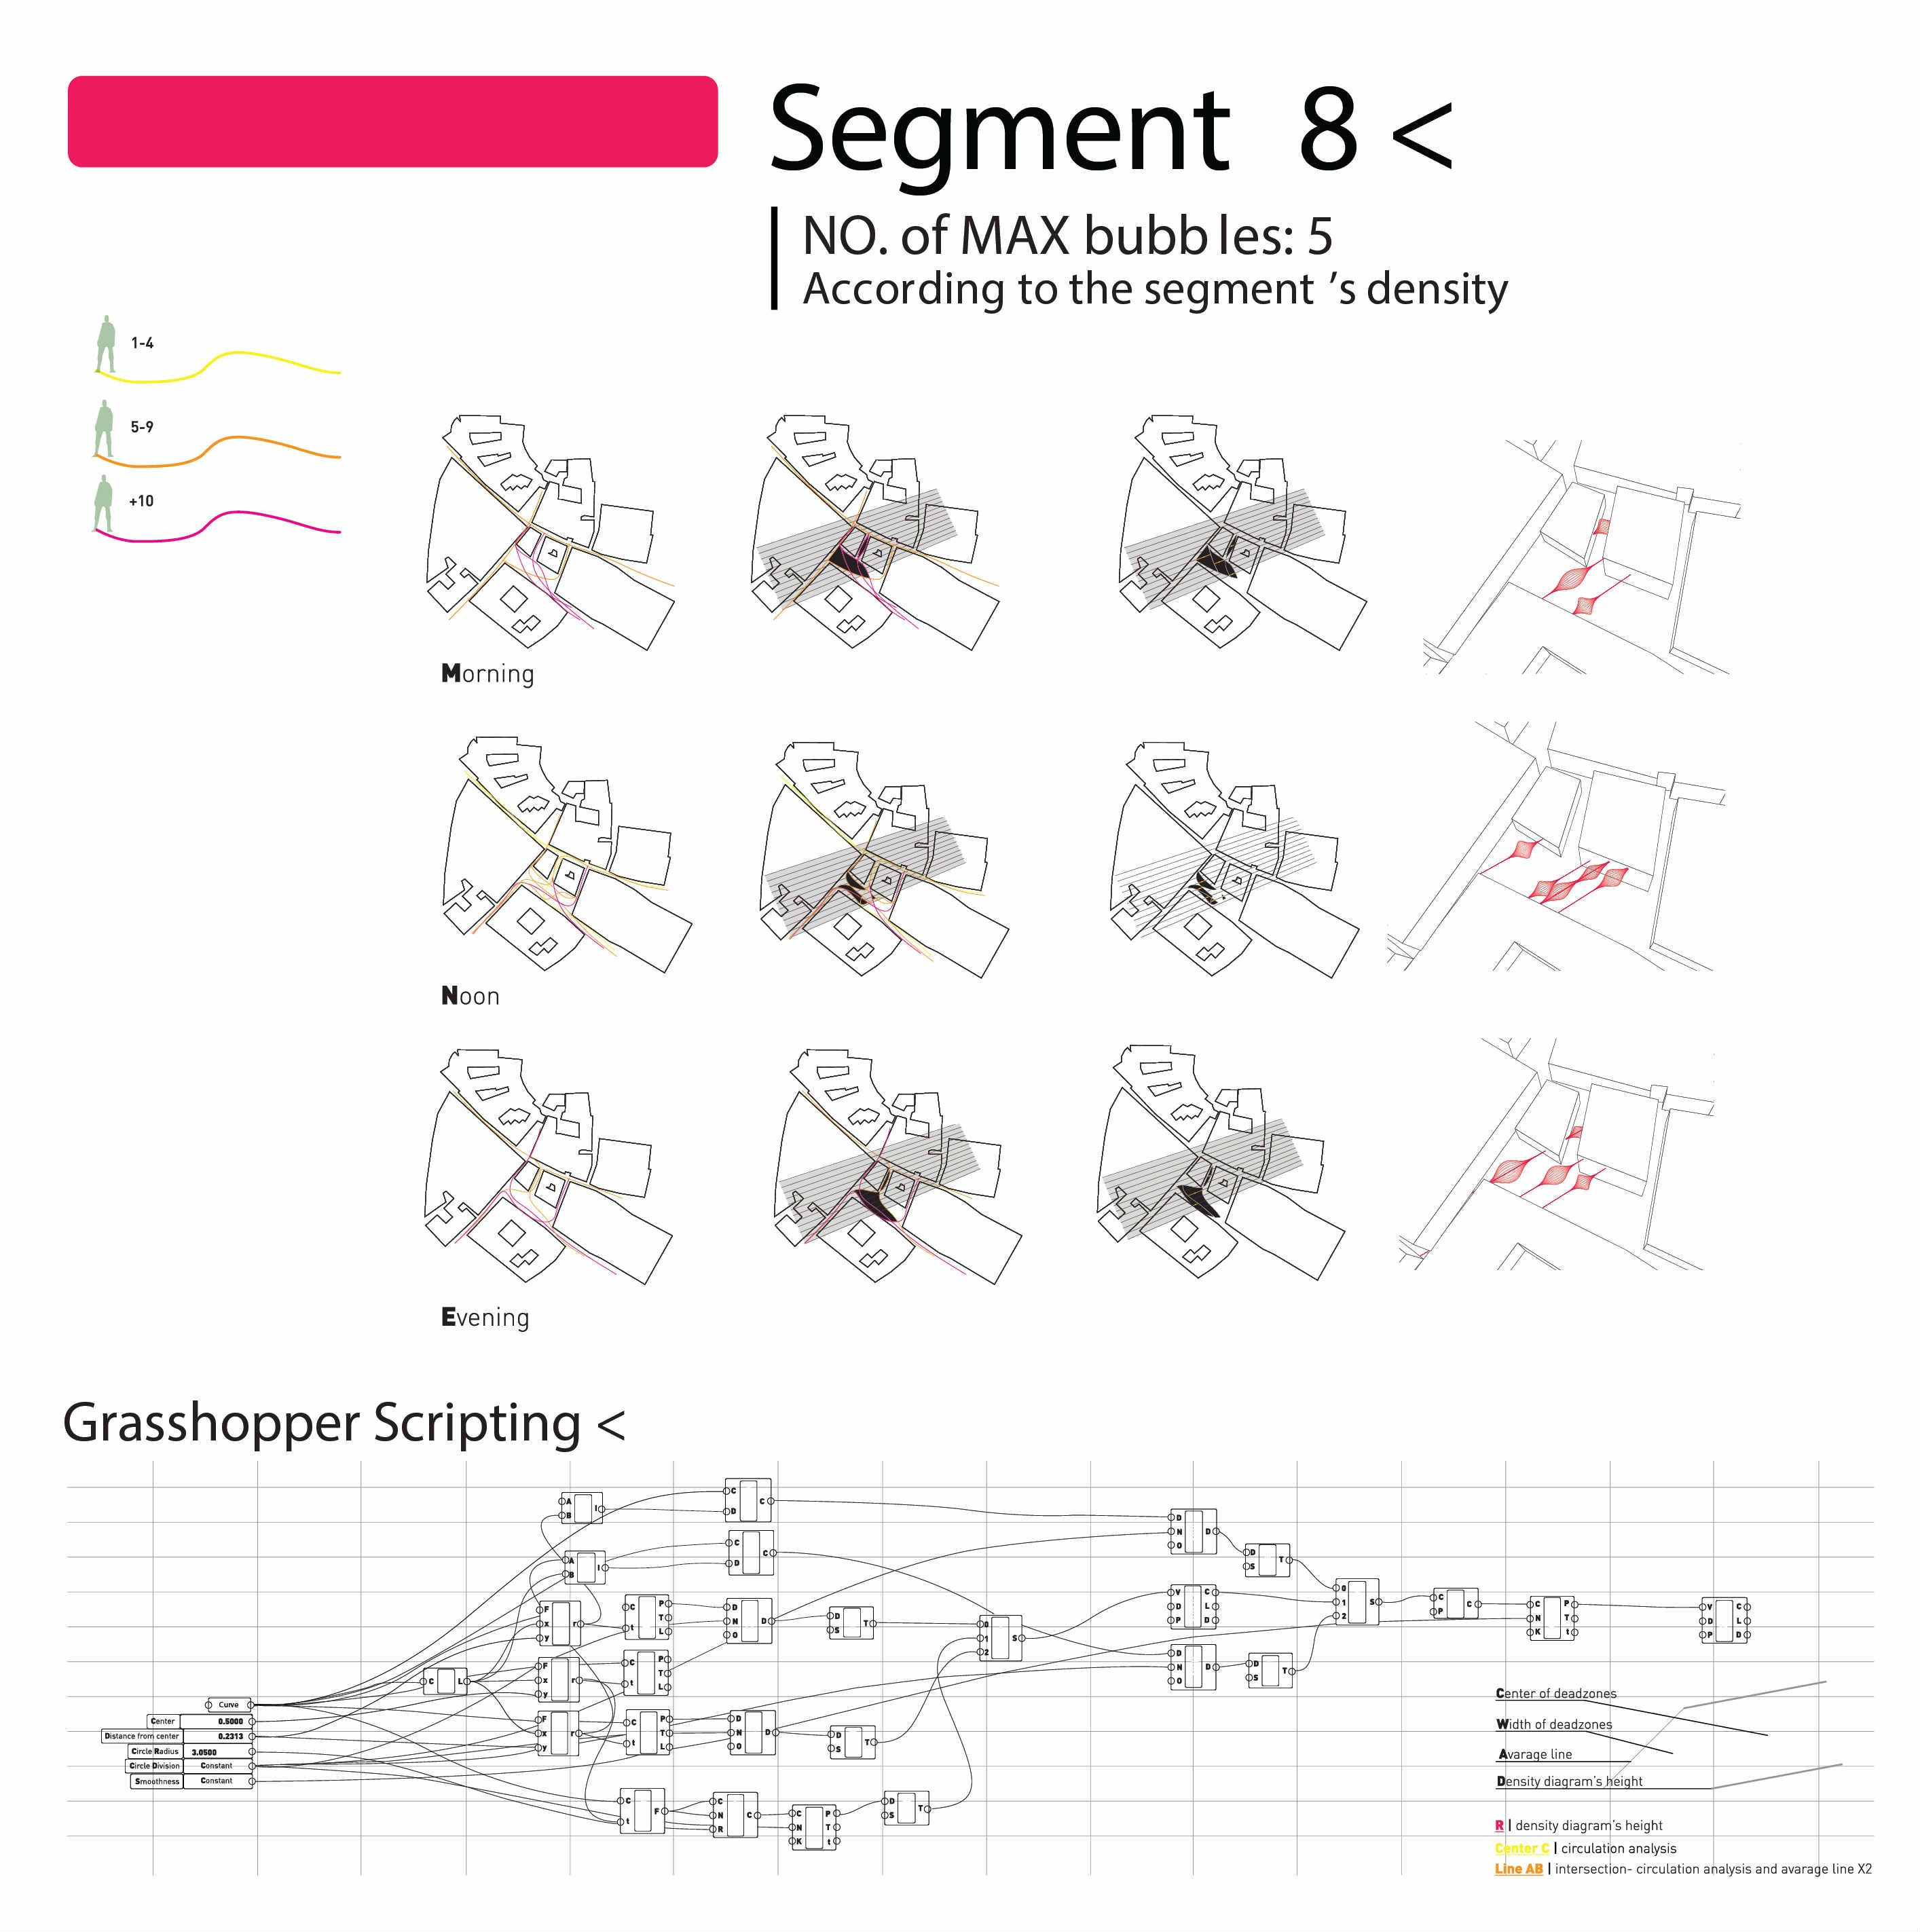 ניתוח סגמנט אחד ויצירת סקריפט בגראסהופר